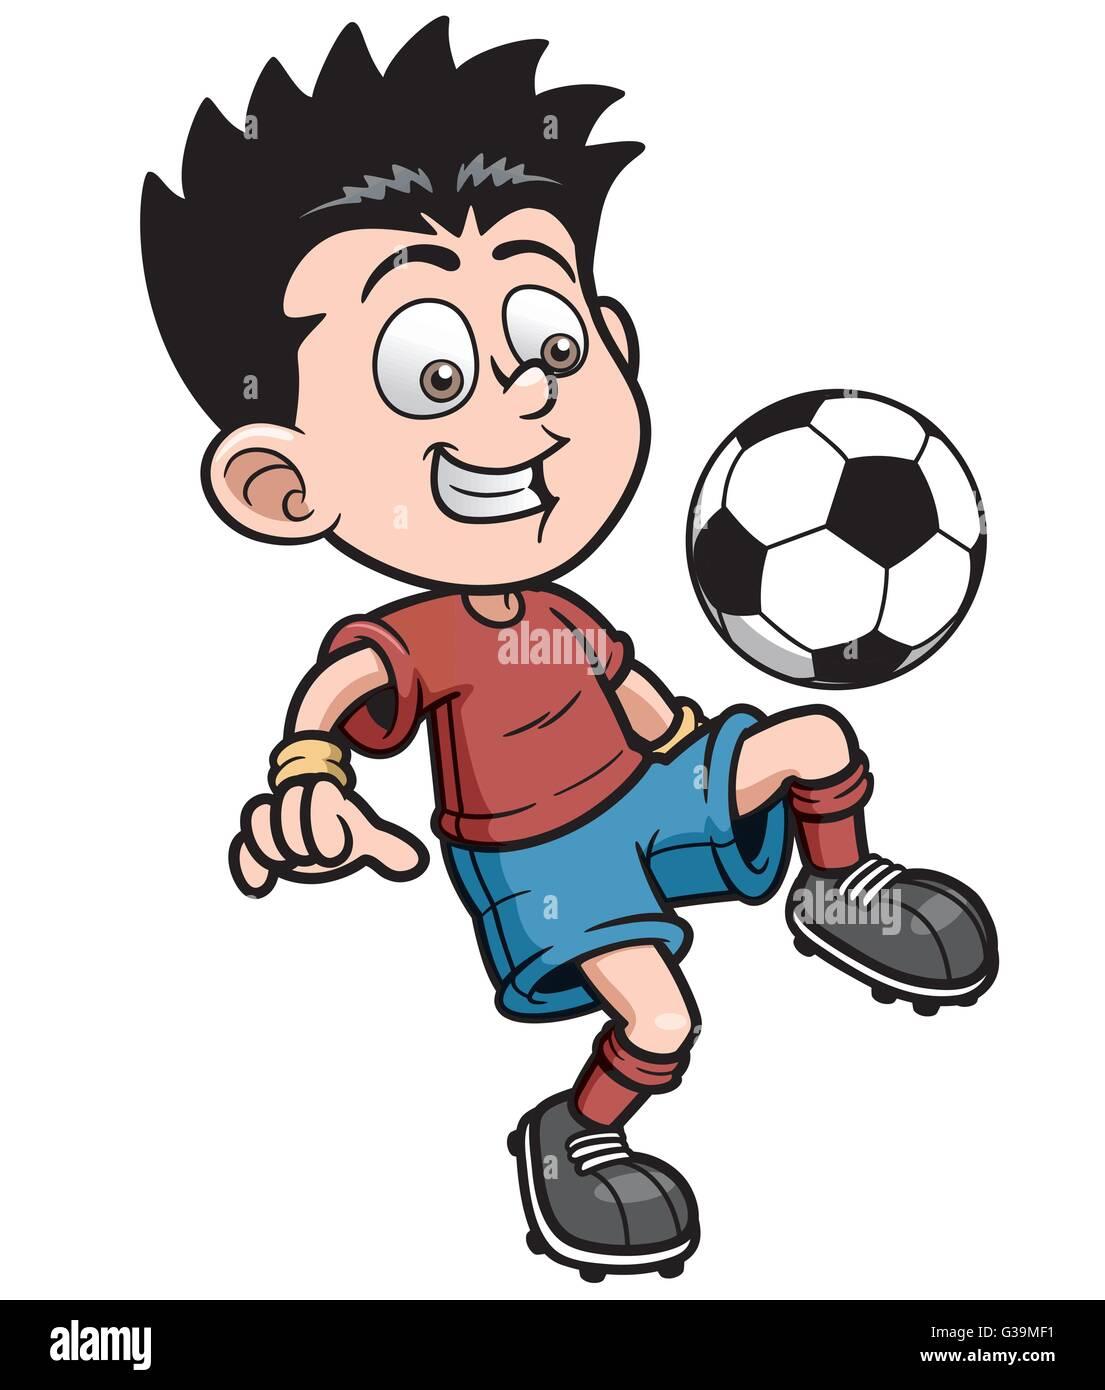 Kids Playing Soccer. Free Cartoon Images | ELSOAR